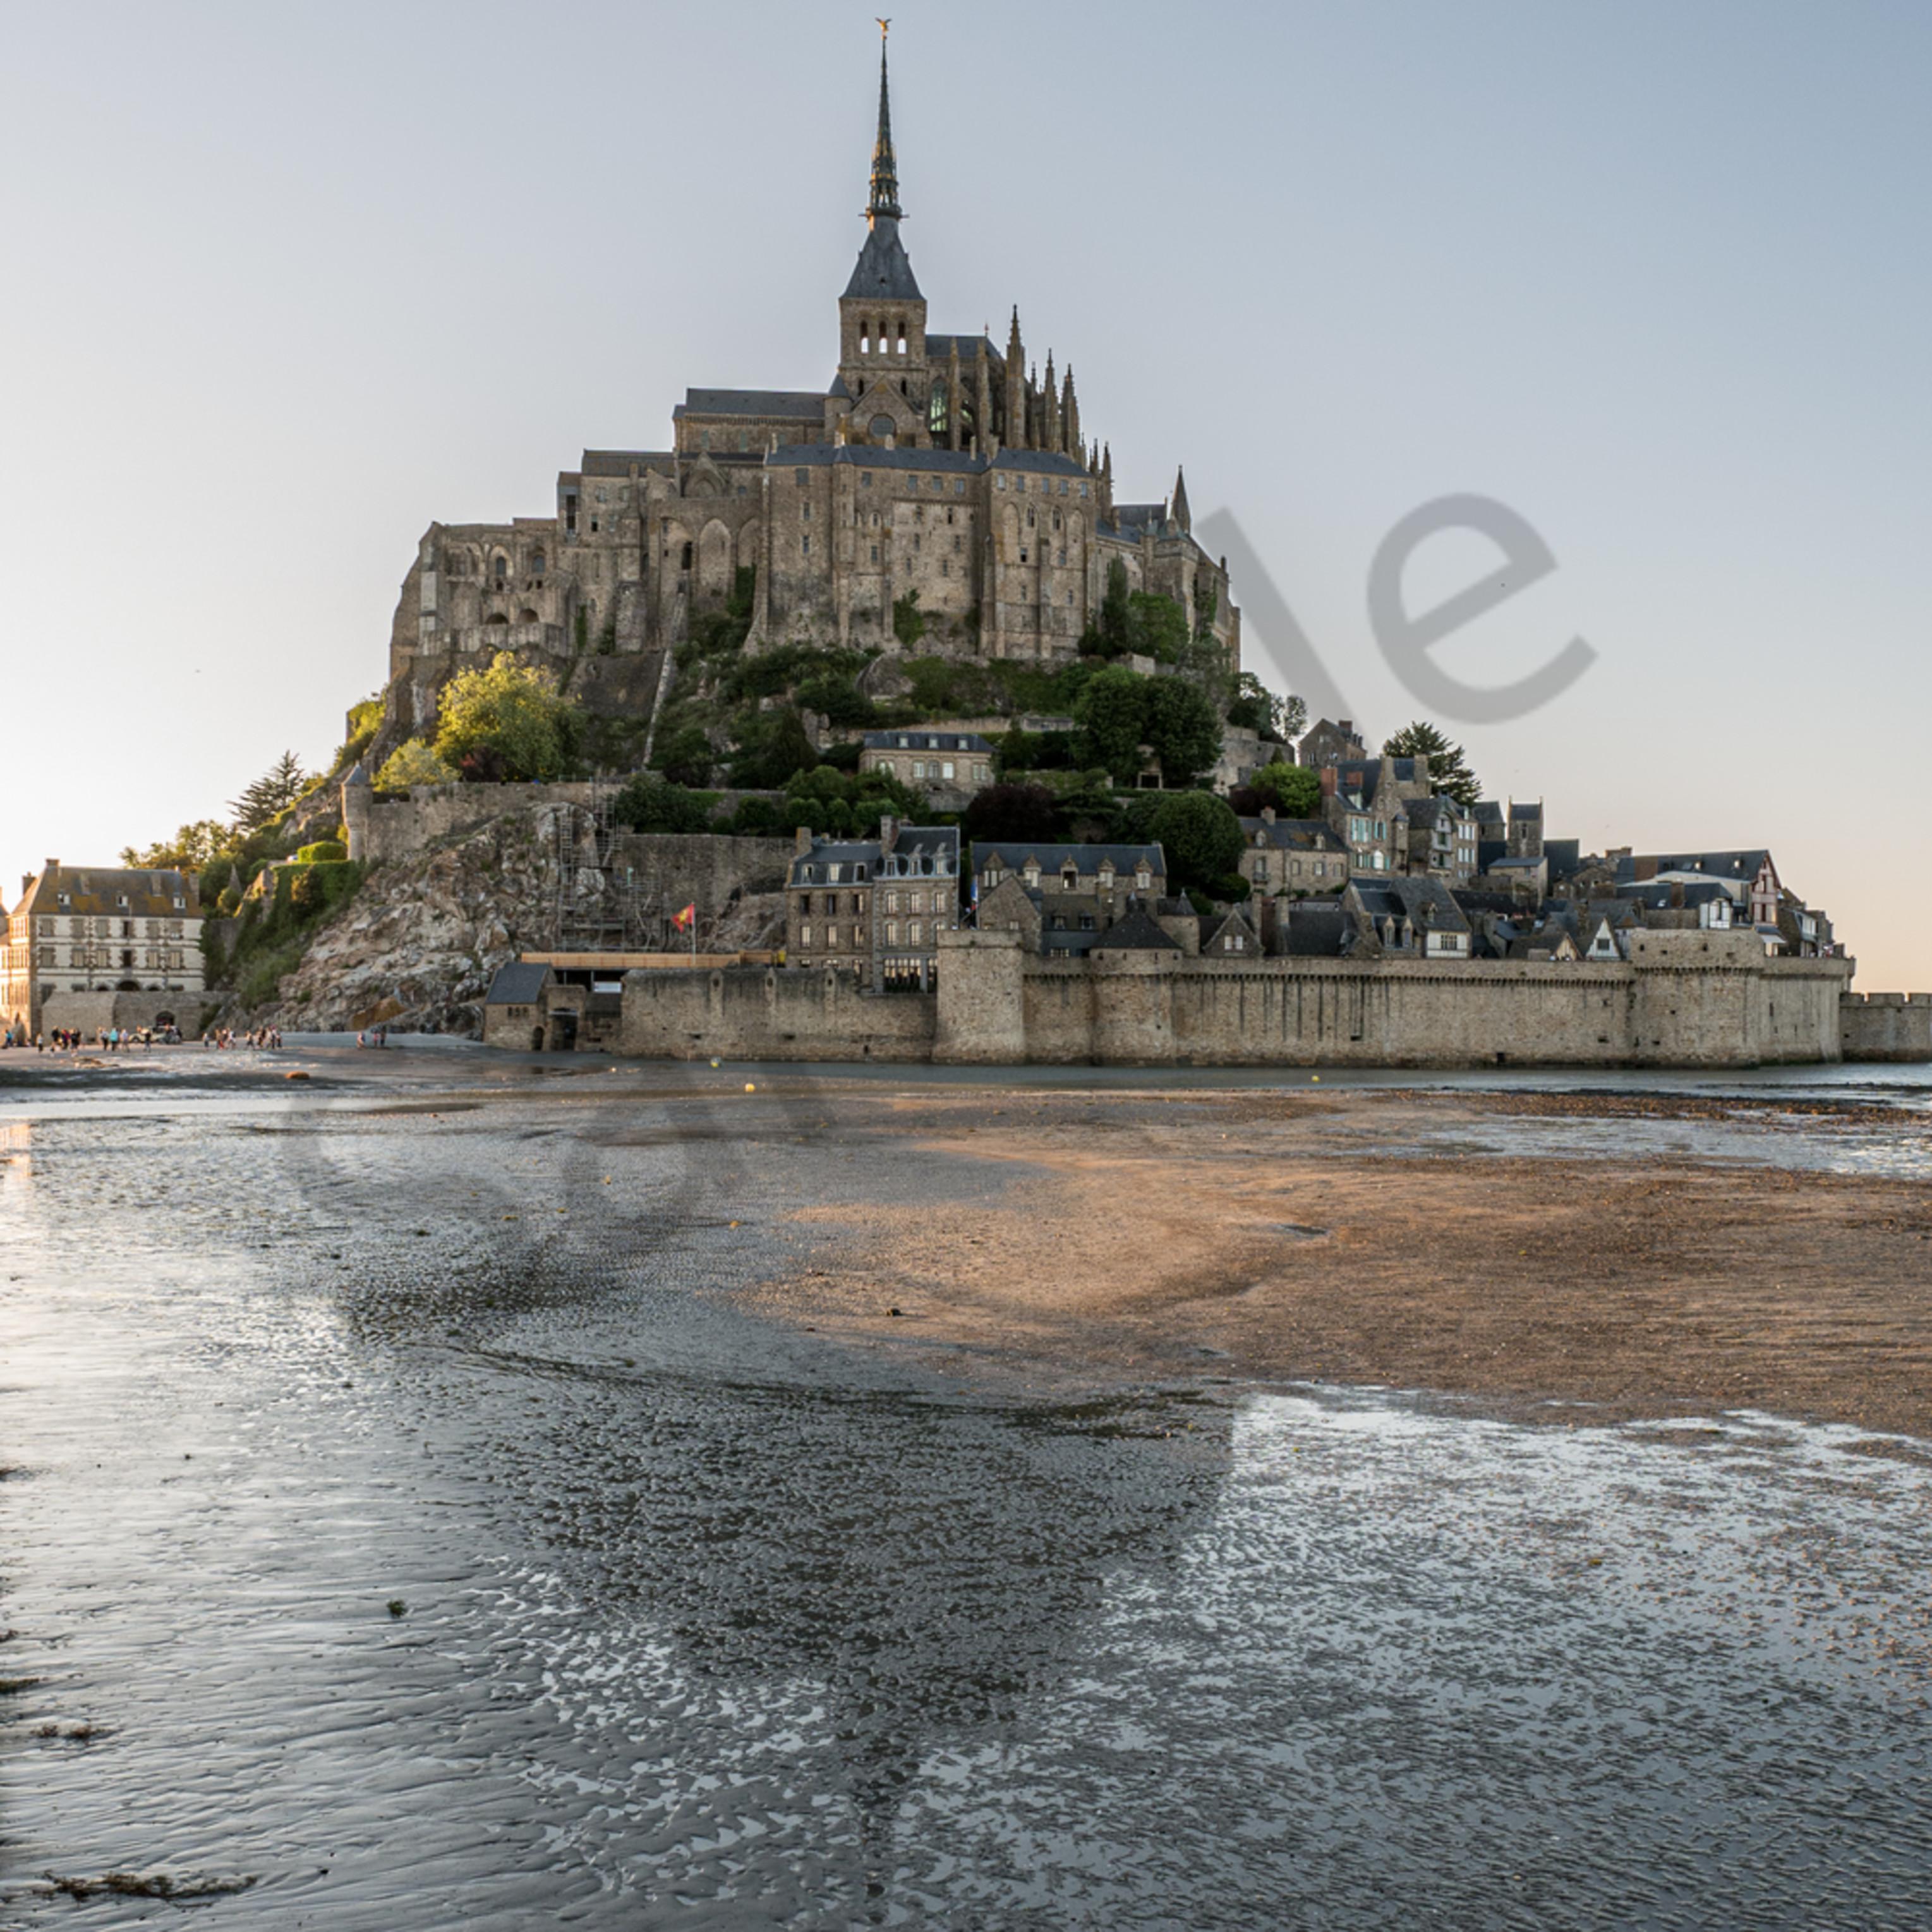 France normany qir5xr